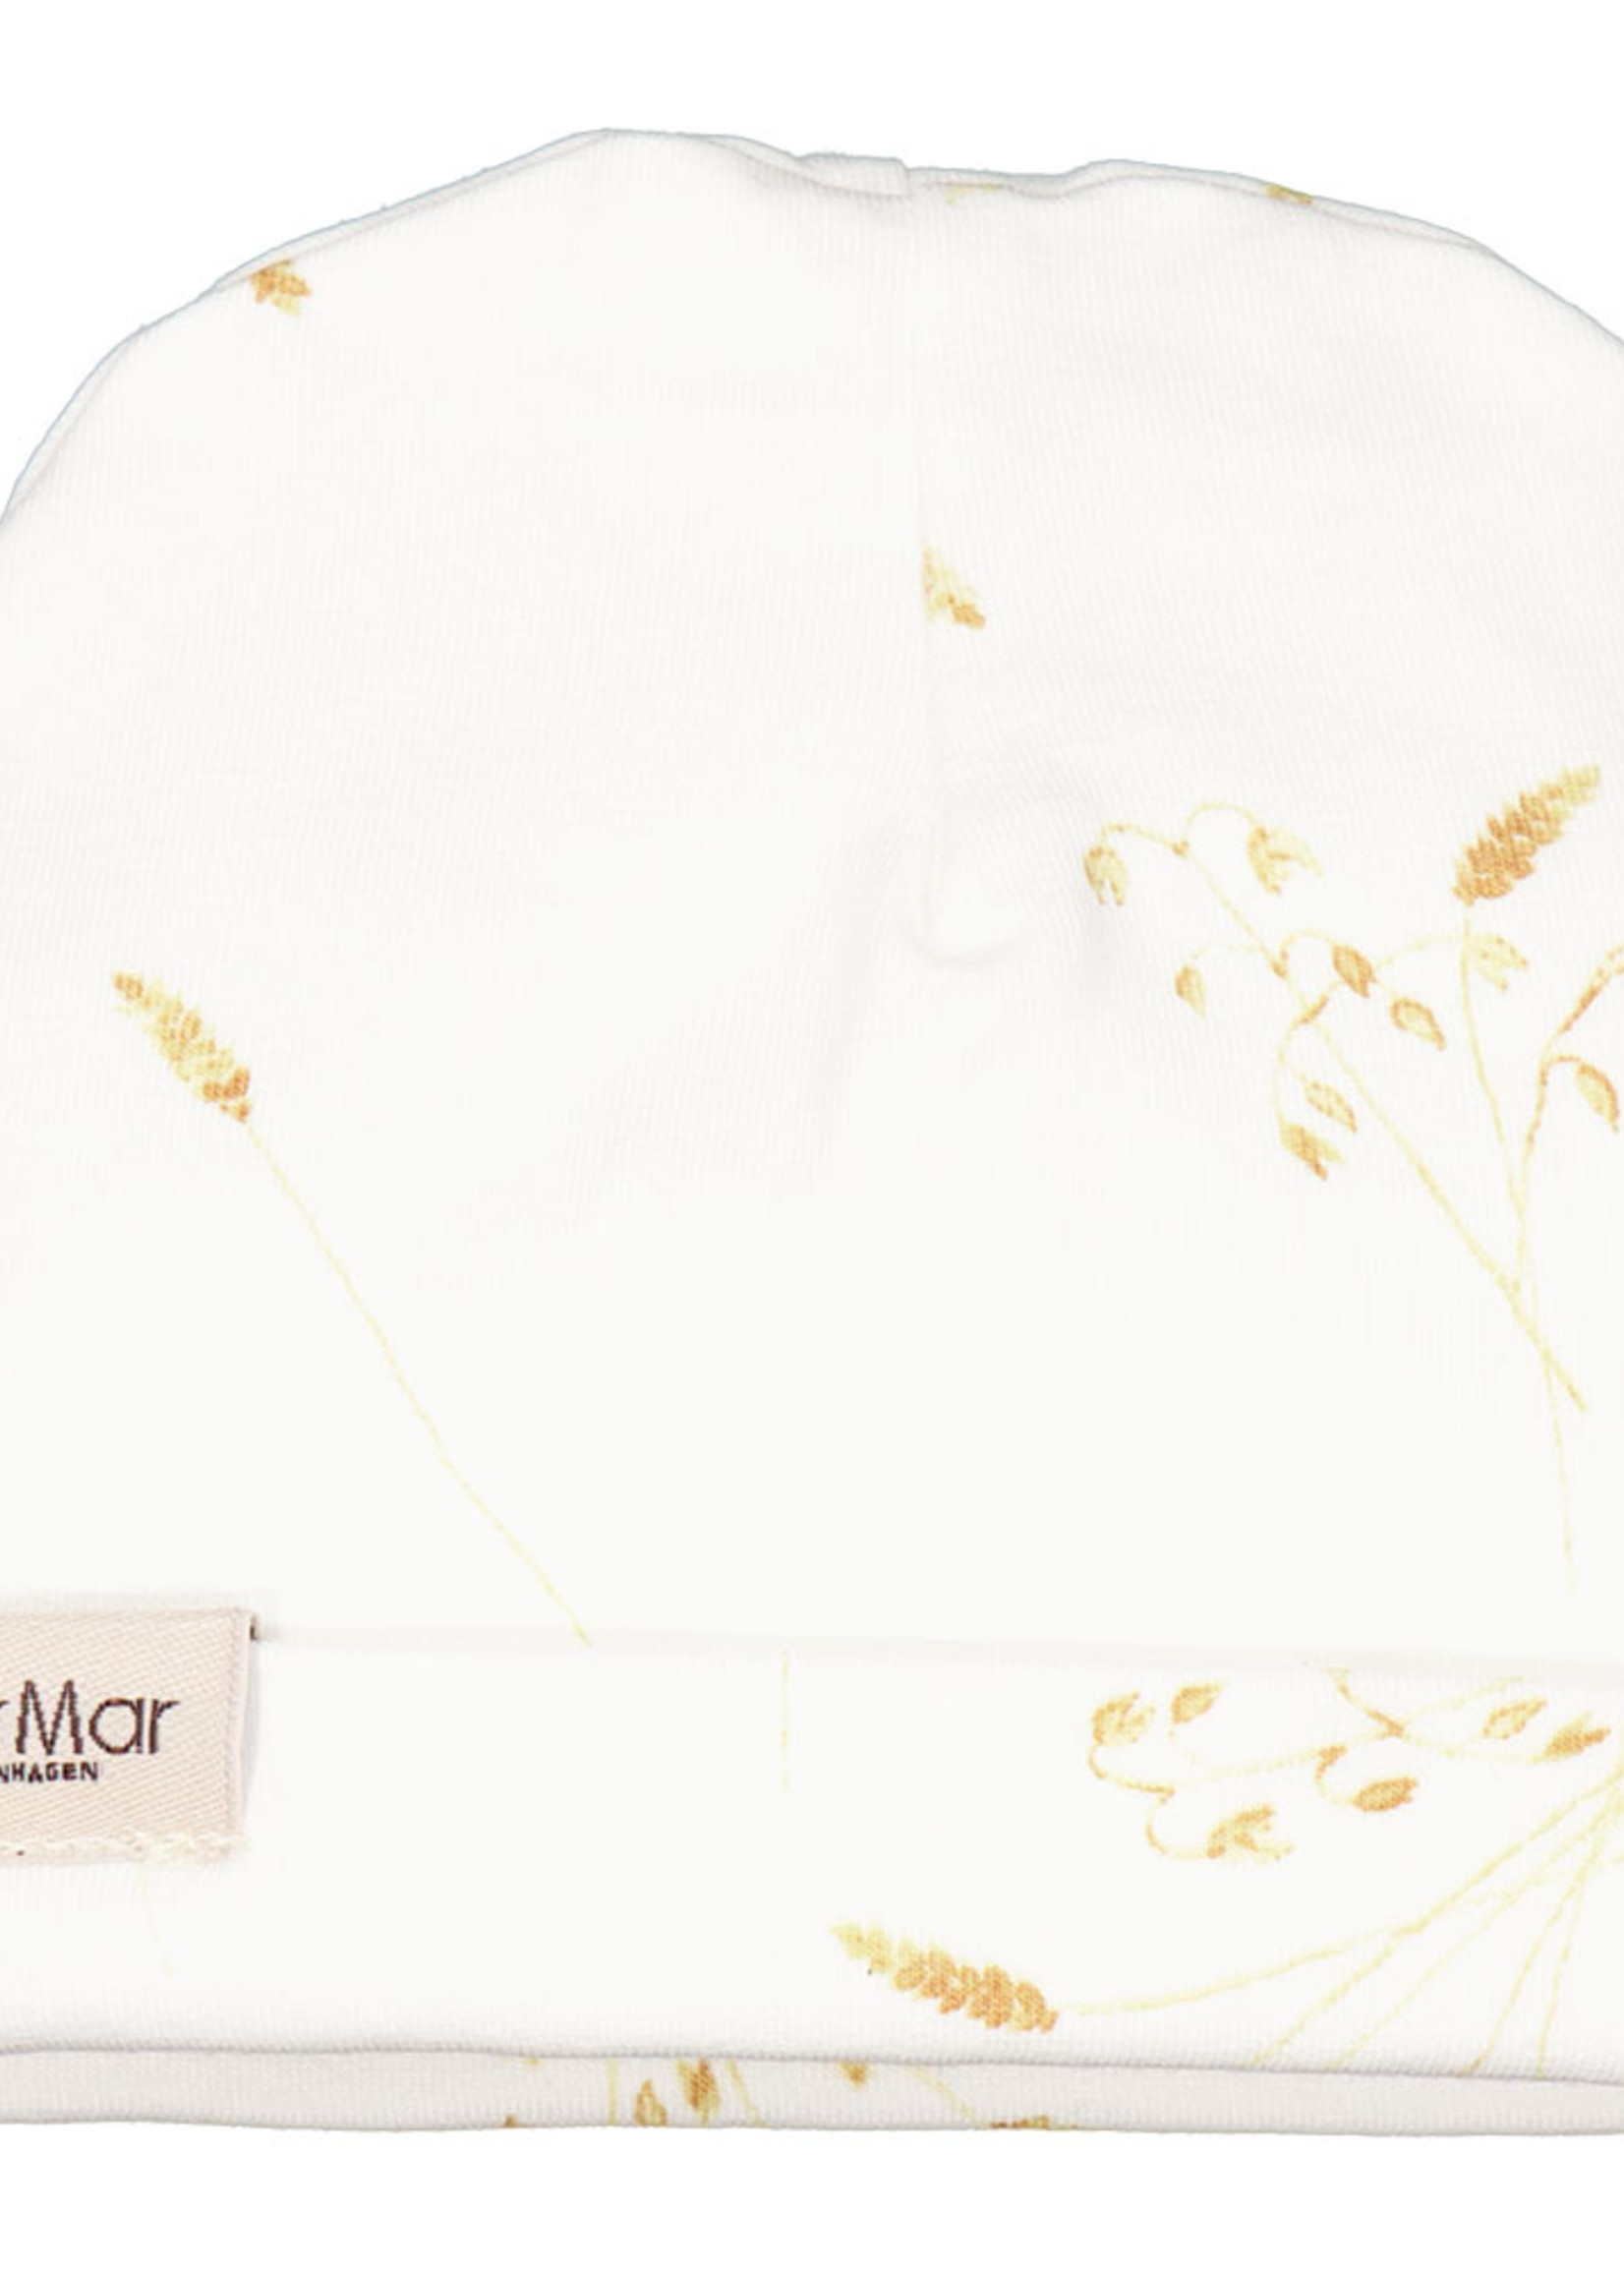 MarMar MarMar - Aiko - Cornfield